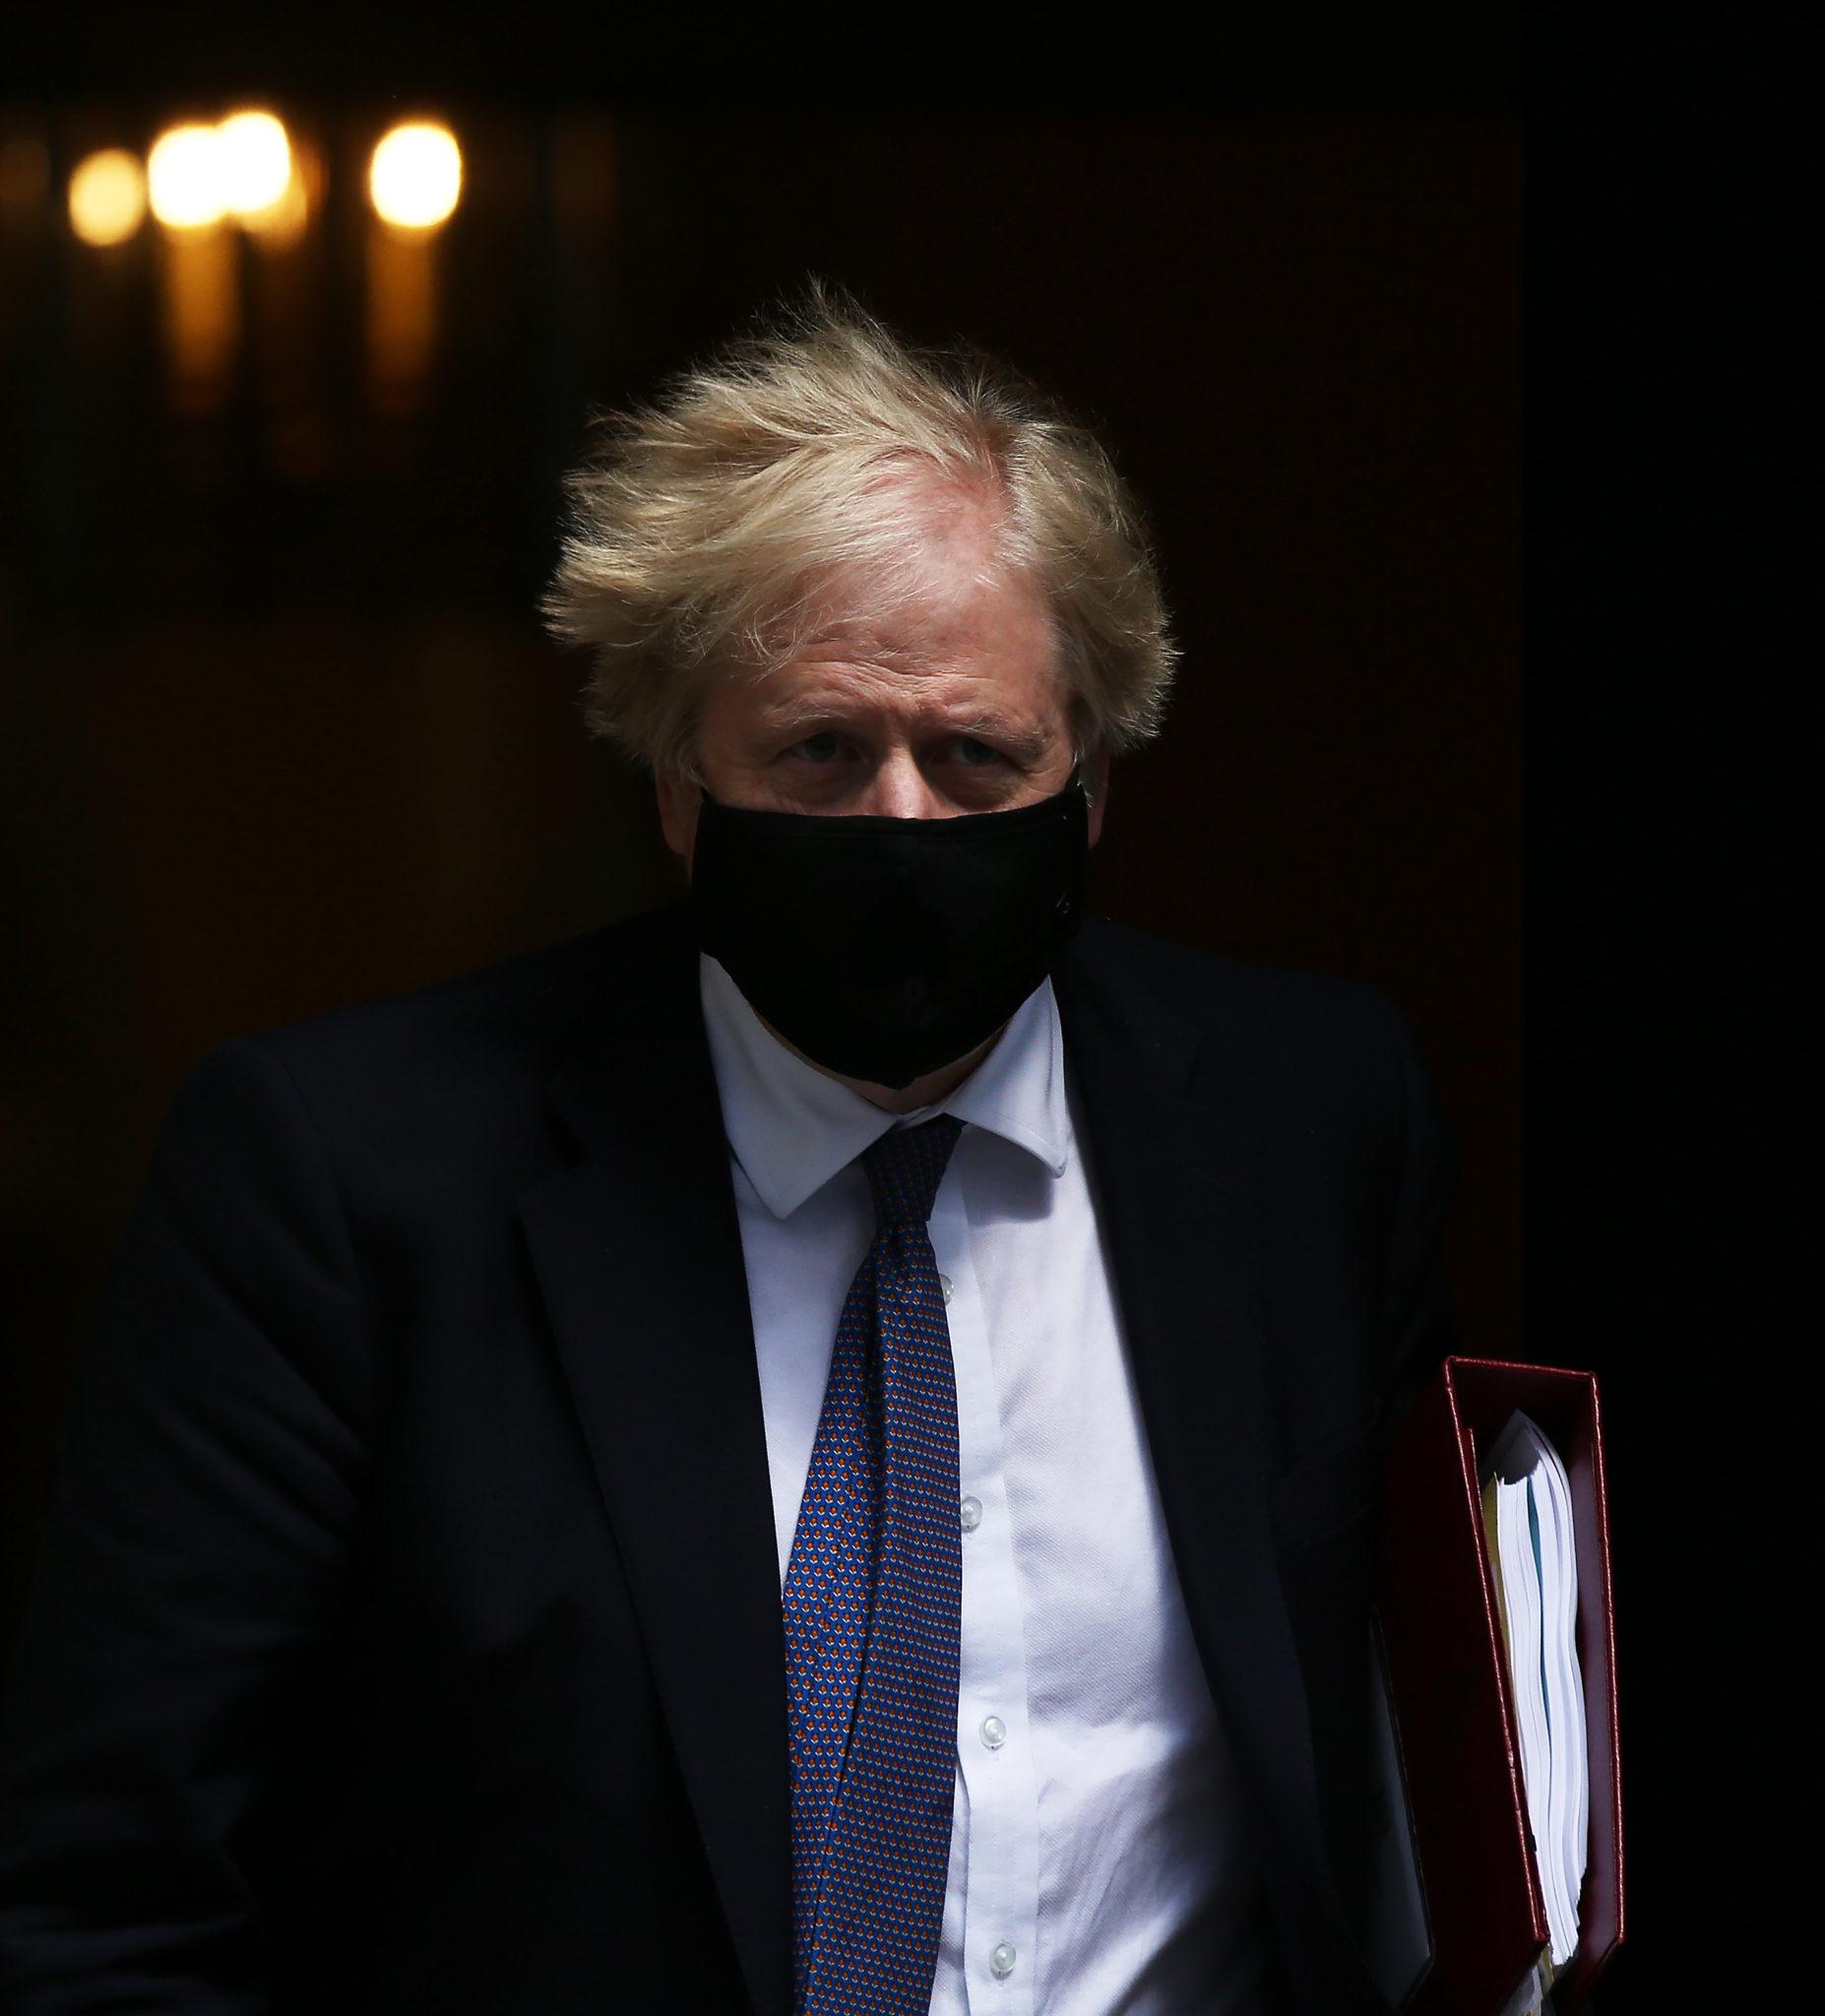 British Prime Minister Boris Johnson is seen leaving 10 Downing Street in London, England.